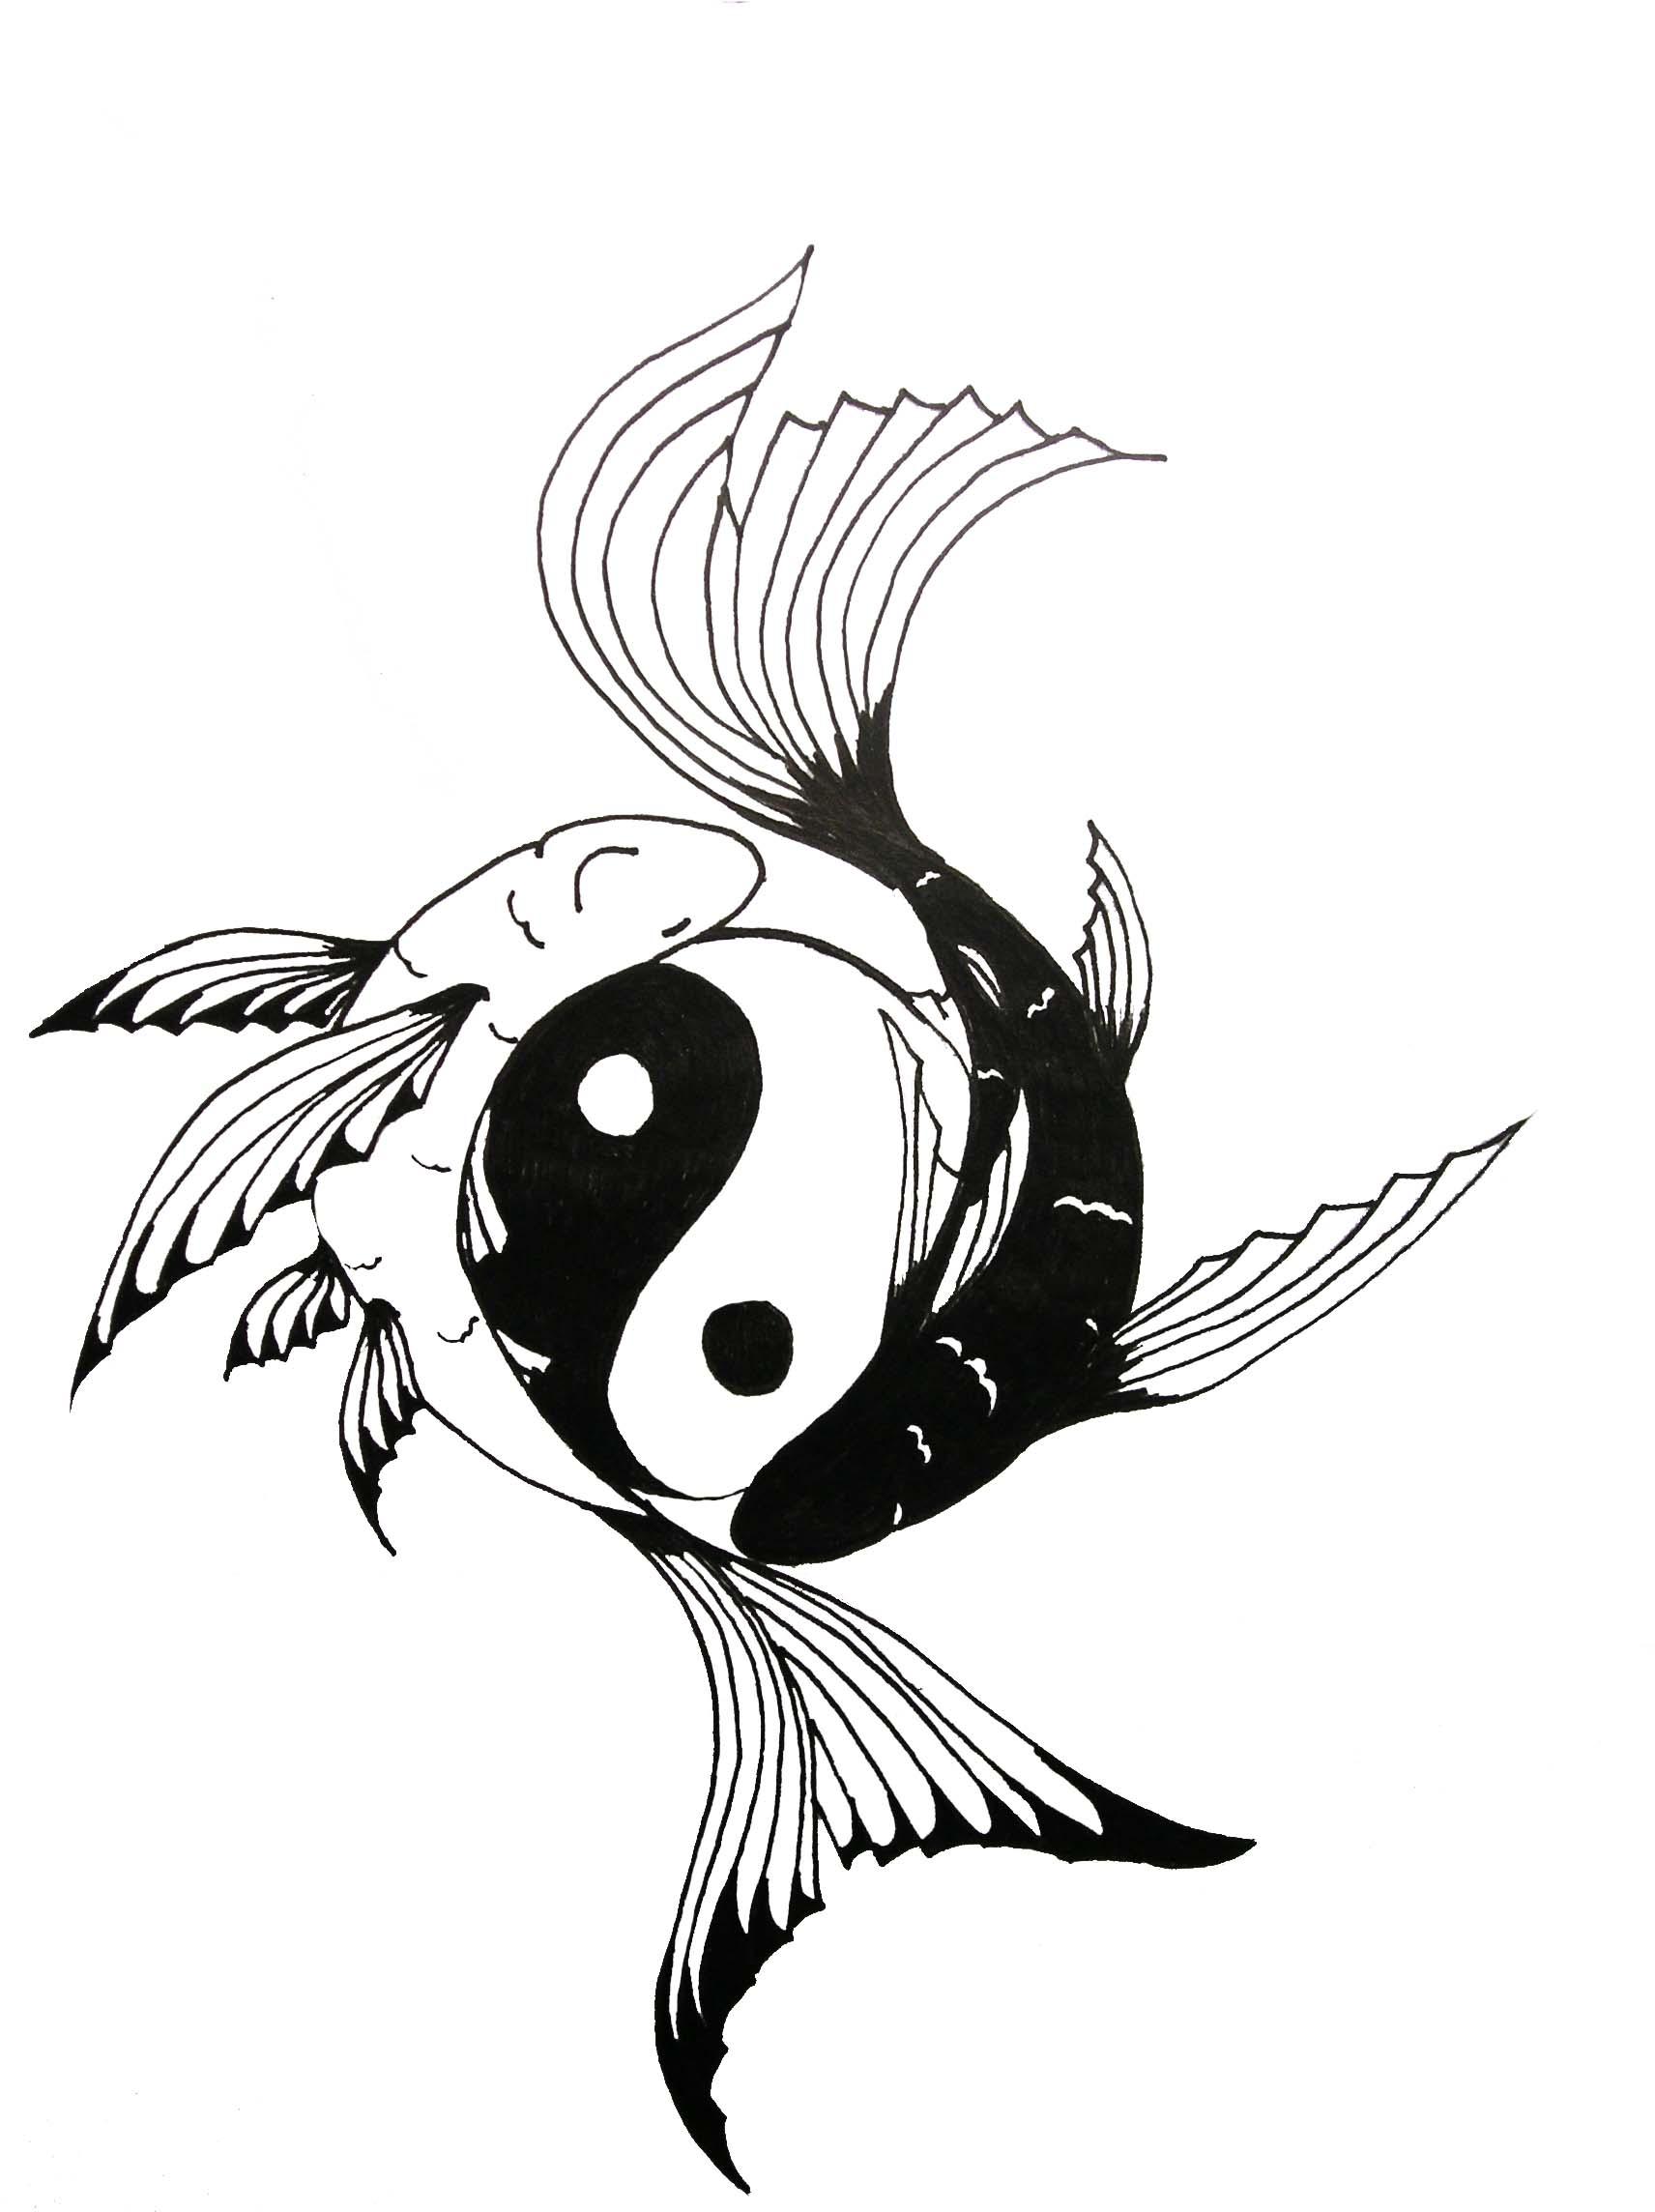 Cool koi fish yin yang tattoo design fish yin yang tattoo designs publicscrutiny Image collections